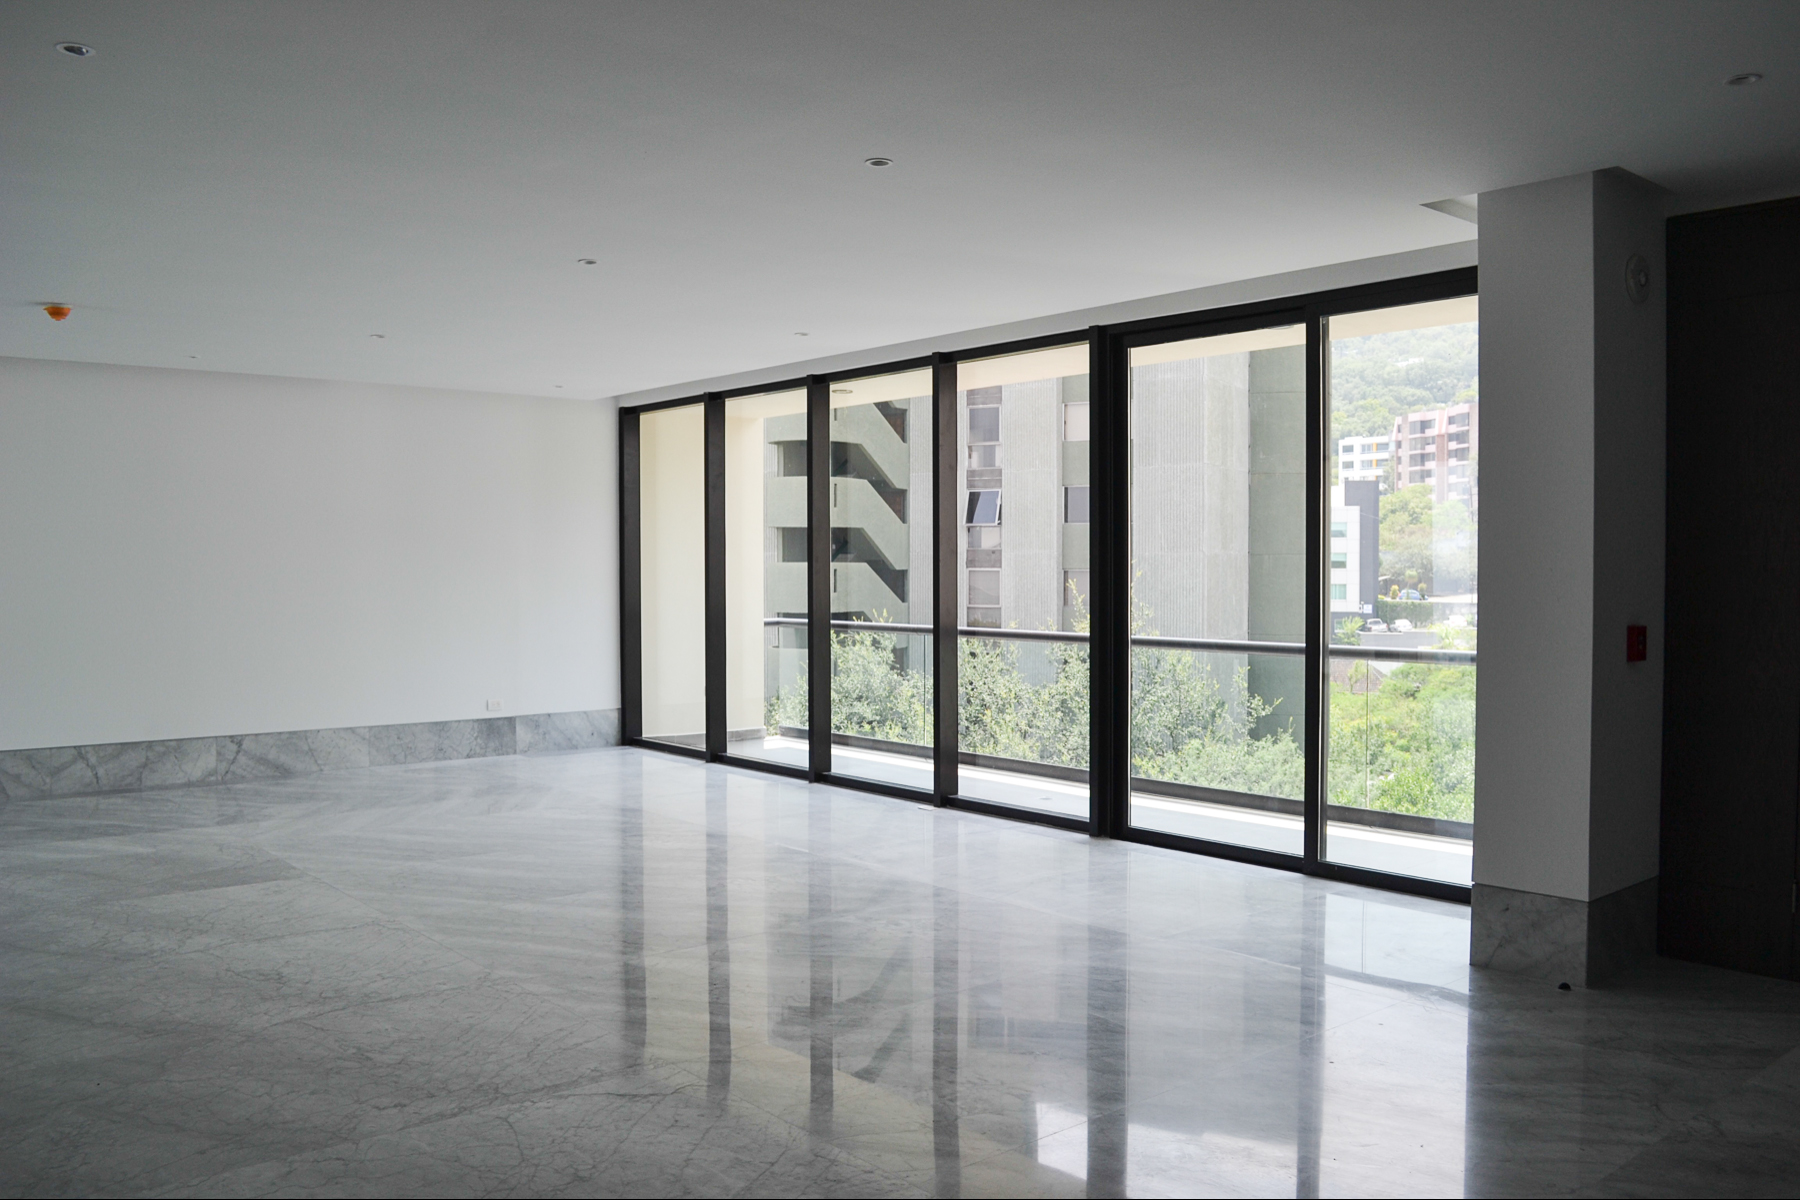 Additional photo for property listing at Torre Chambord San Pedro Garza Garcia, Nuevo Leon Mexico